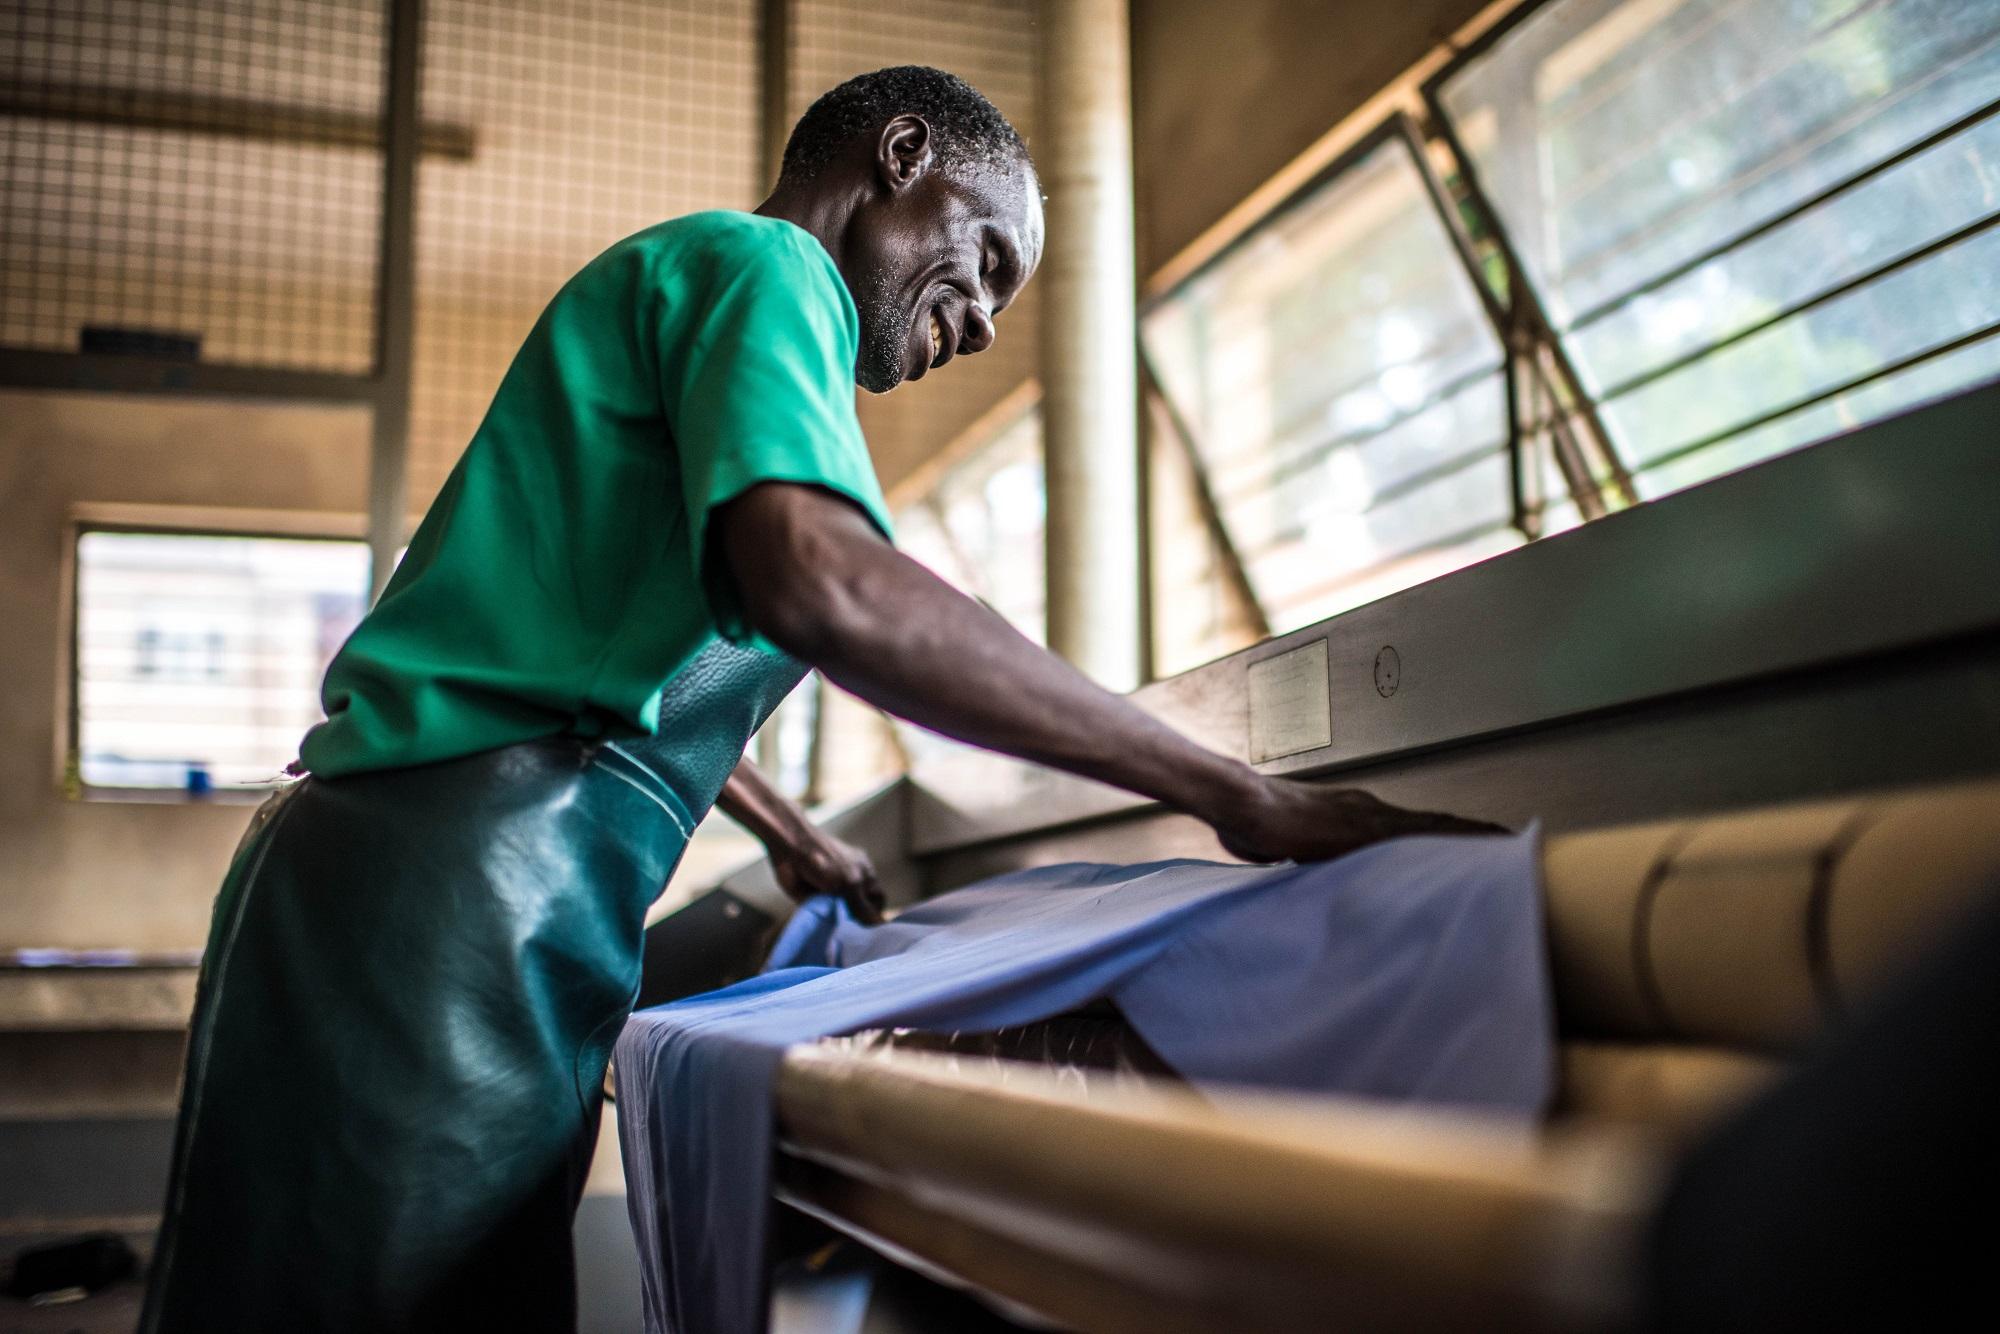 Omiat Mackay, a staff member of the Soroti Regional Referral Hospital, processes the laundry.